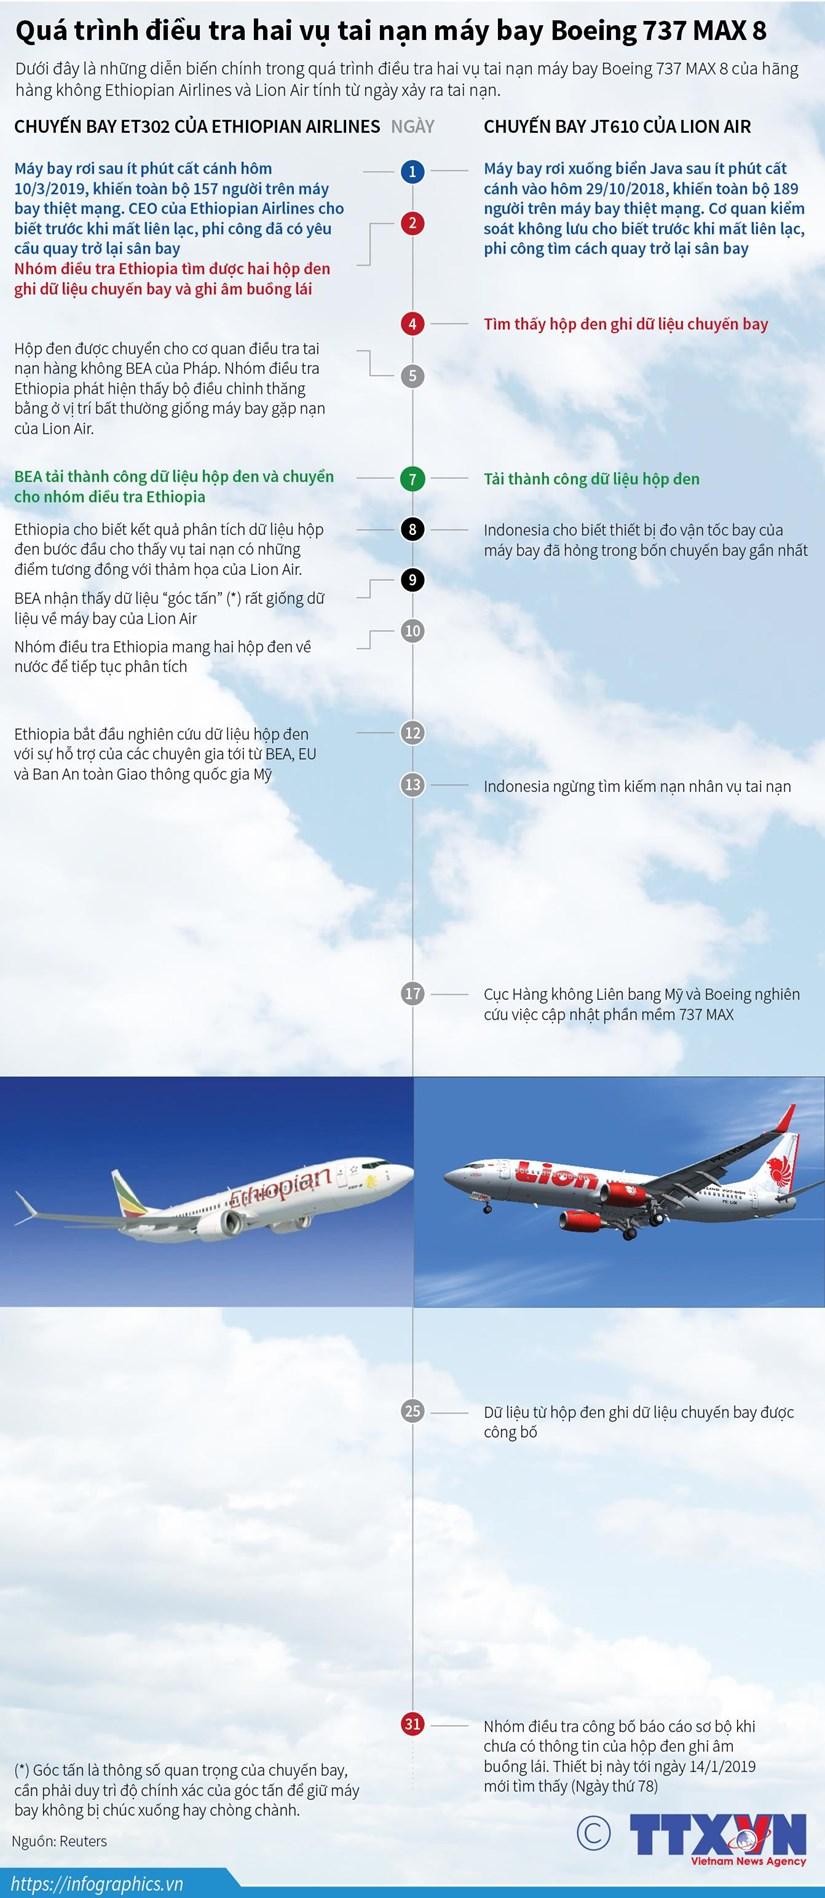 Qua trinh dieu tra hai vu tai nan may bay Boeing 737 MAX 8 hinh anh 1